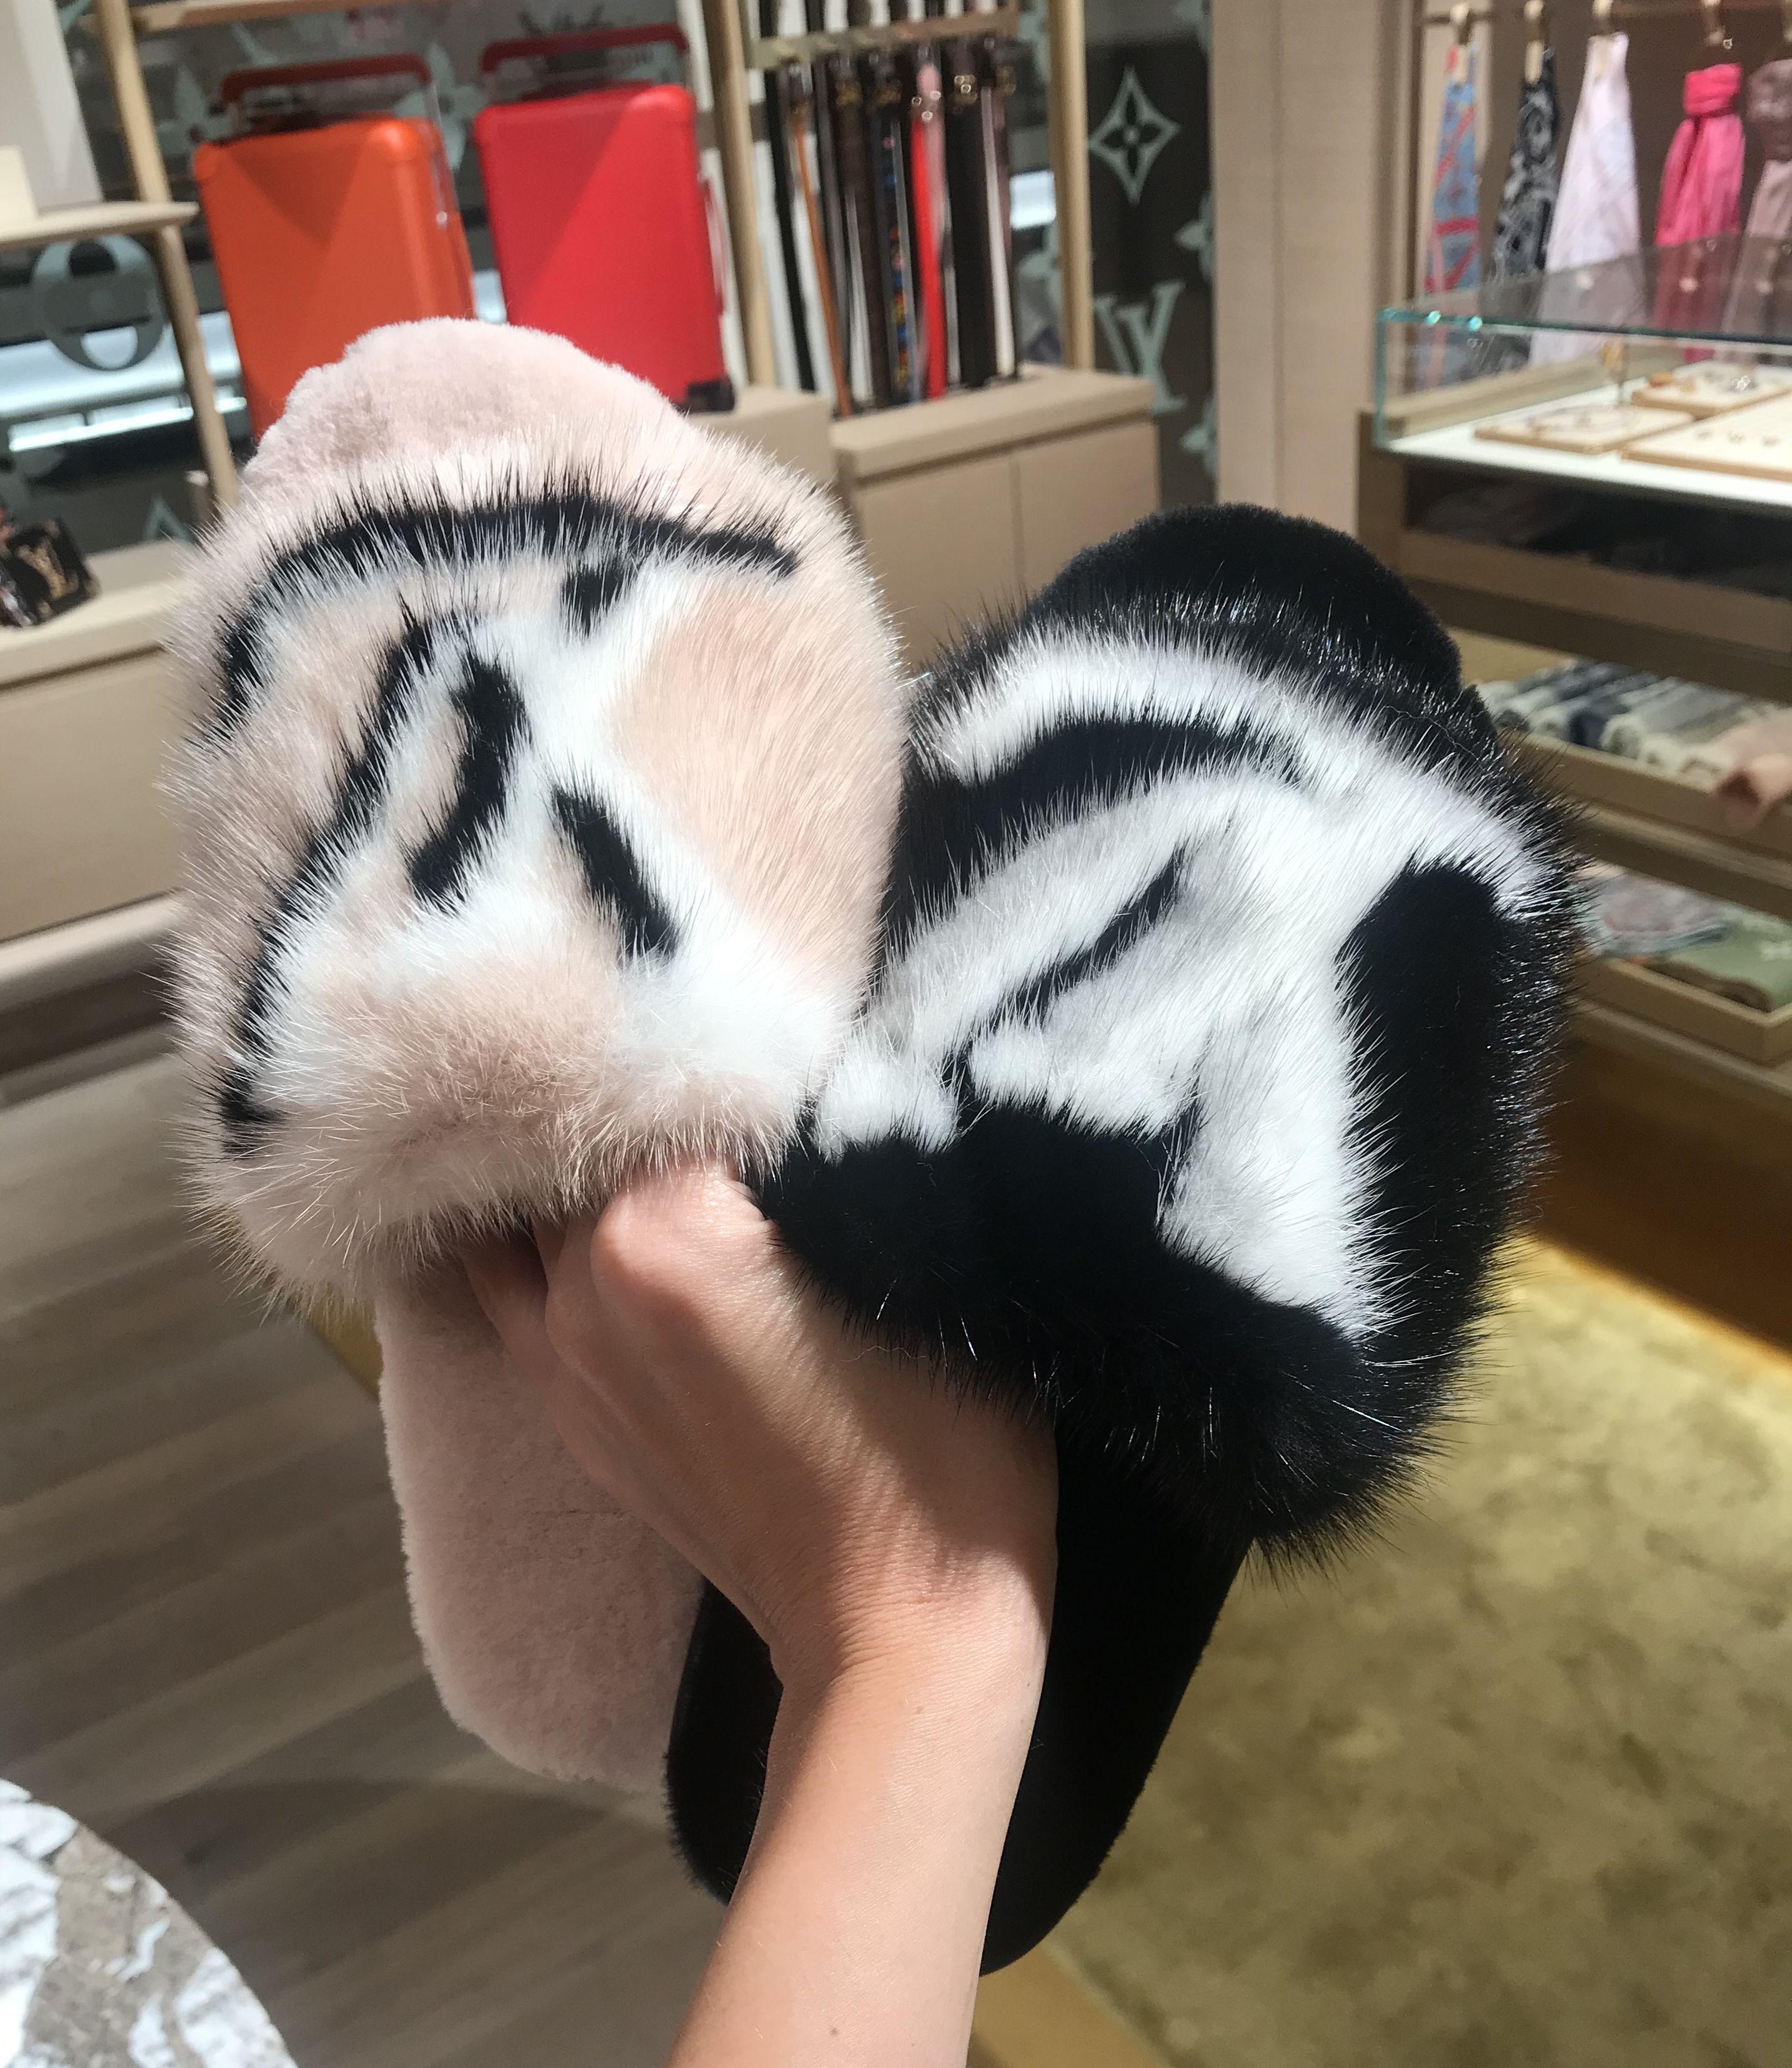 louis vuitton slippers pink fur